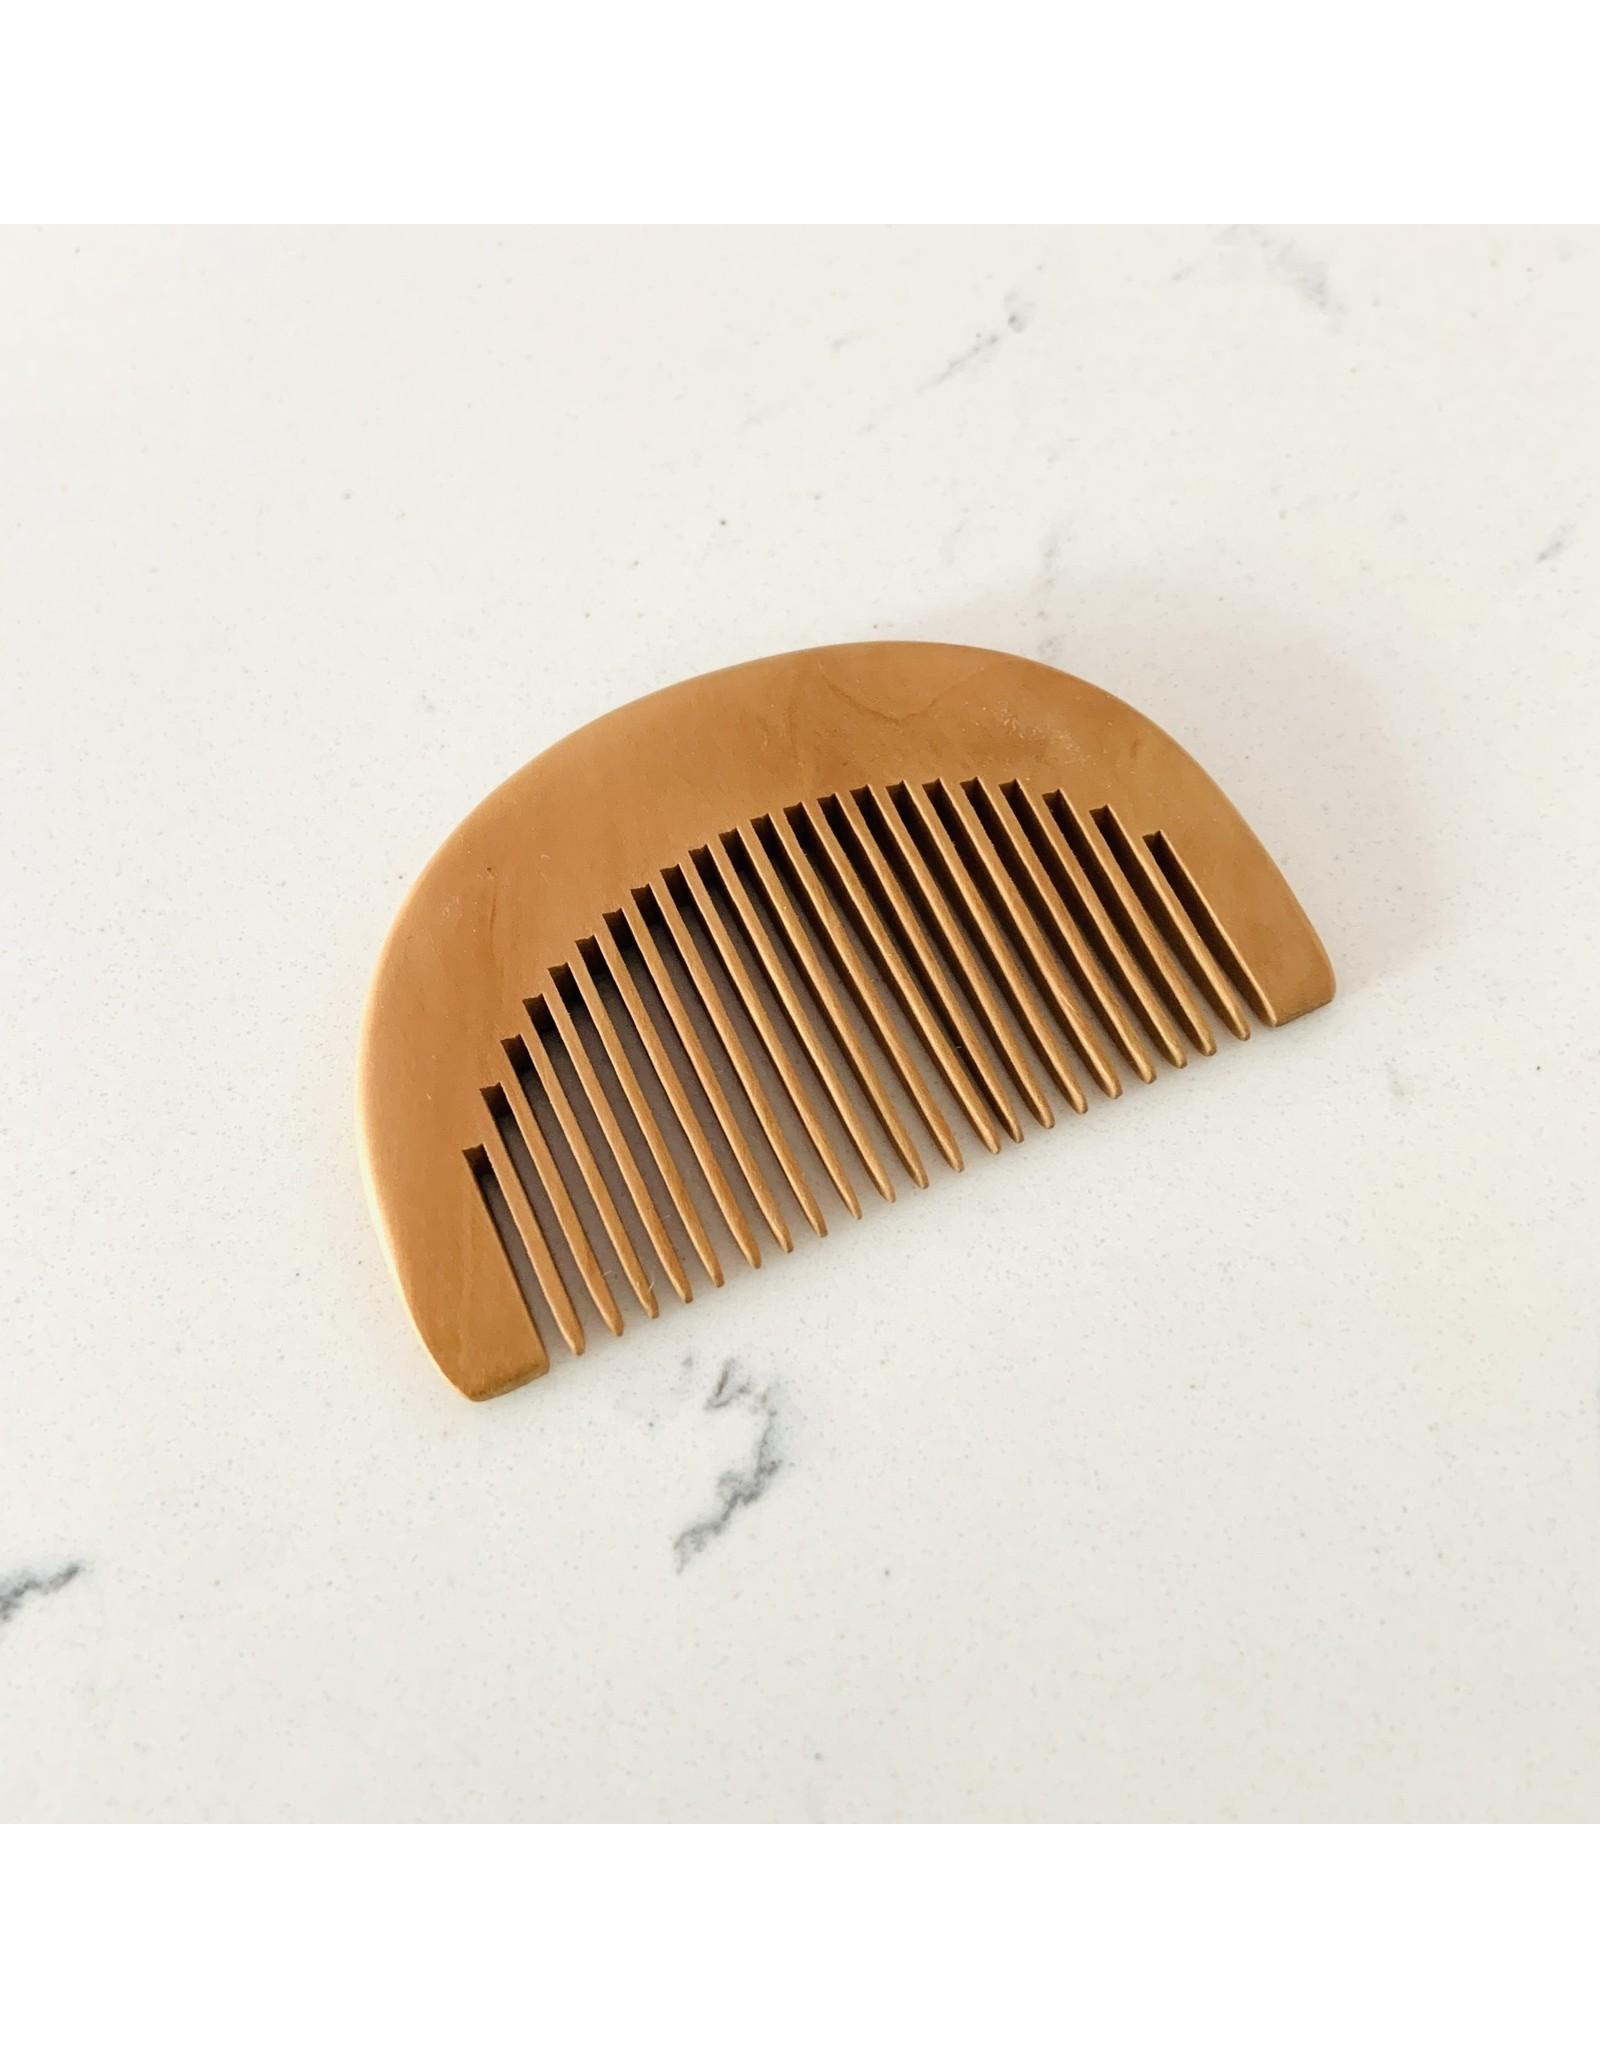 The Bearded Barber Beard Grooming Accessories